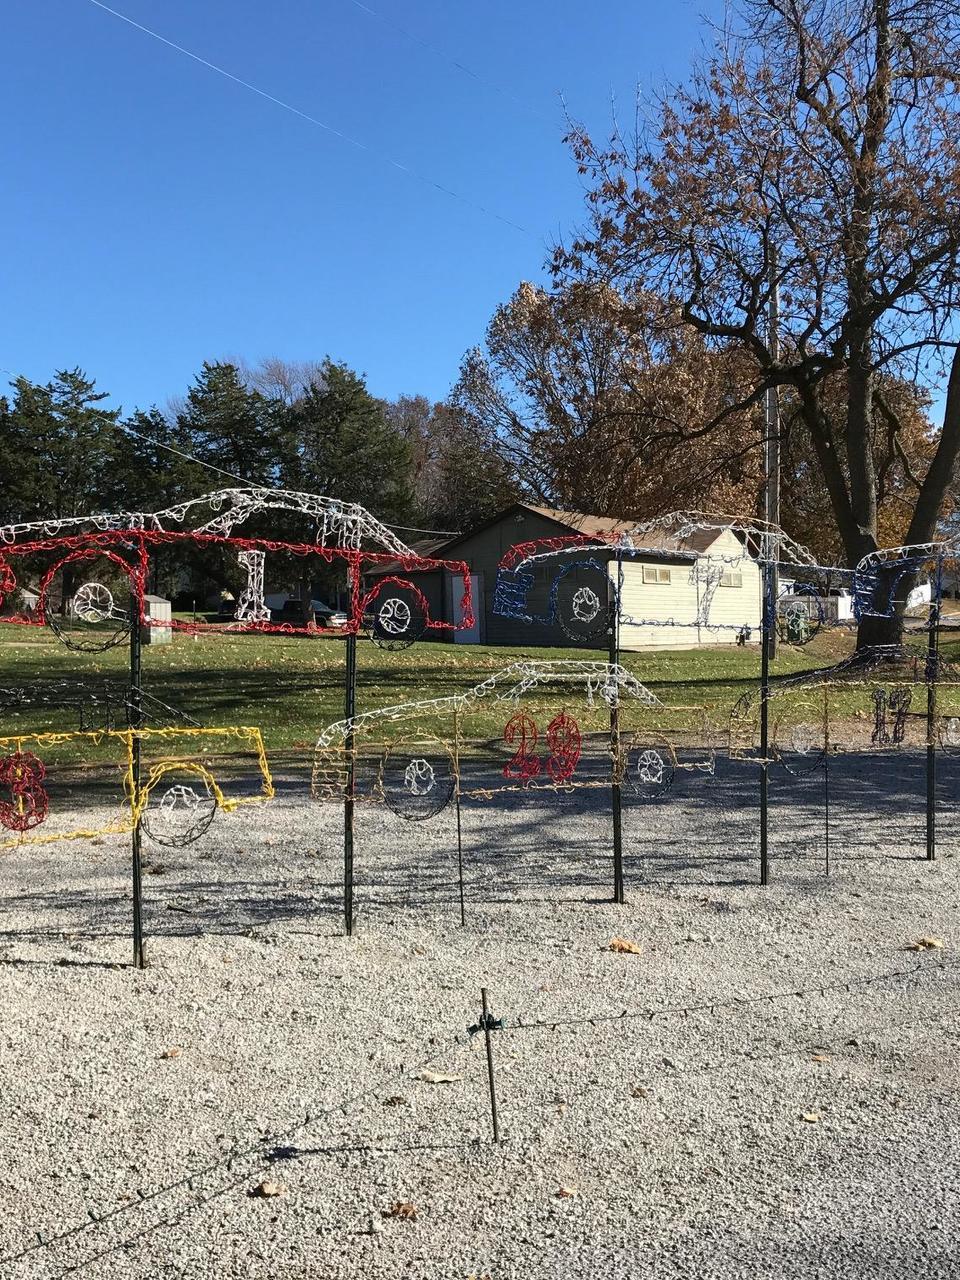 Christmas displays fill Rand Park   KHQA